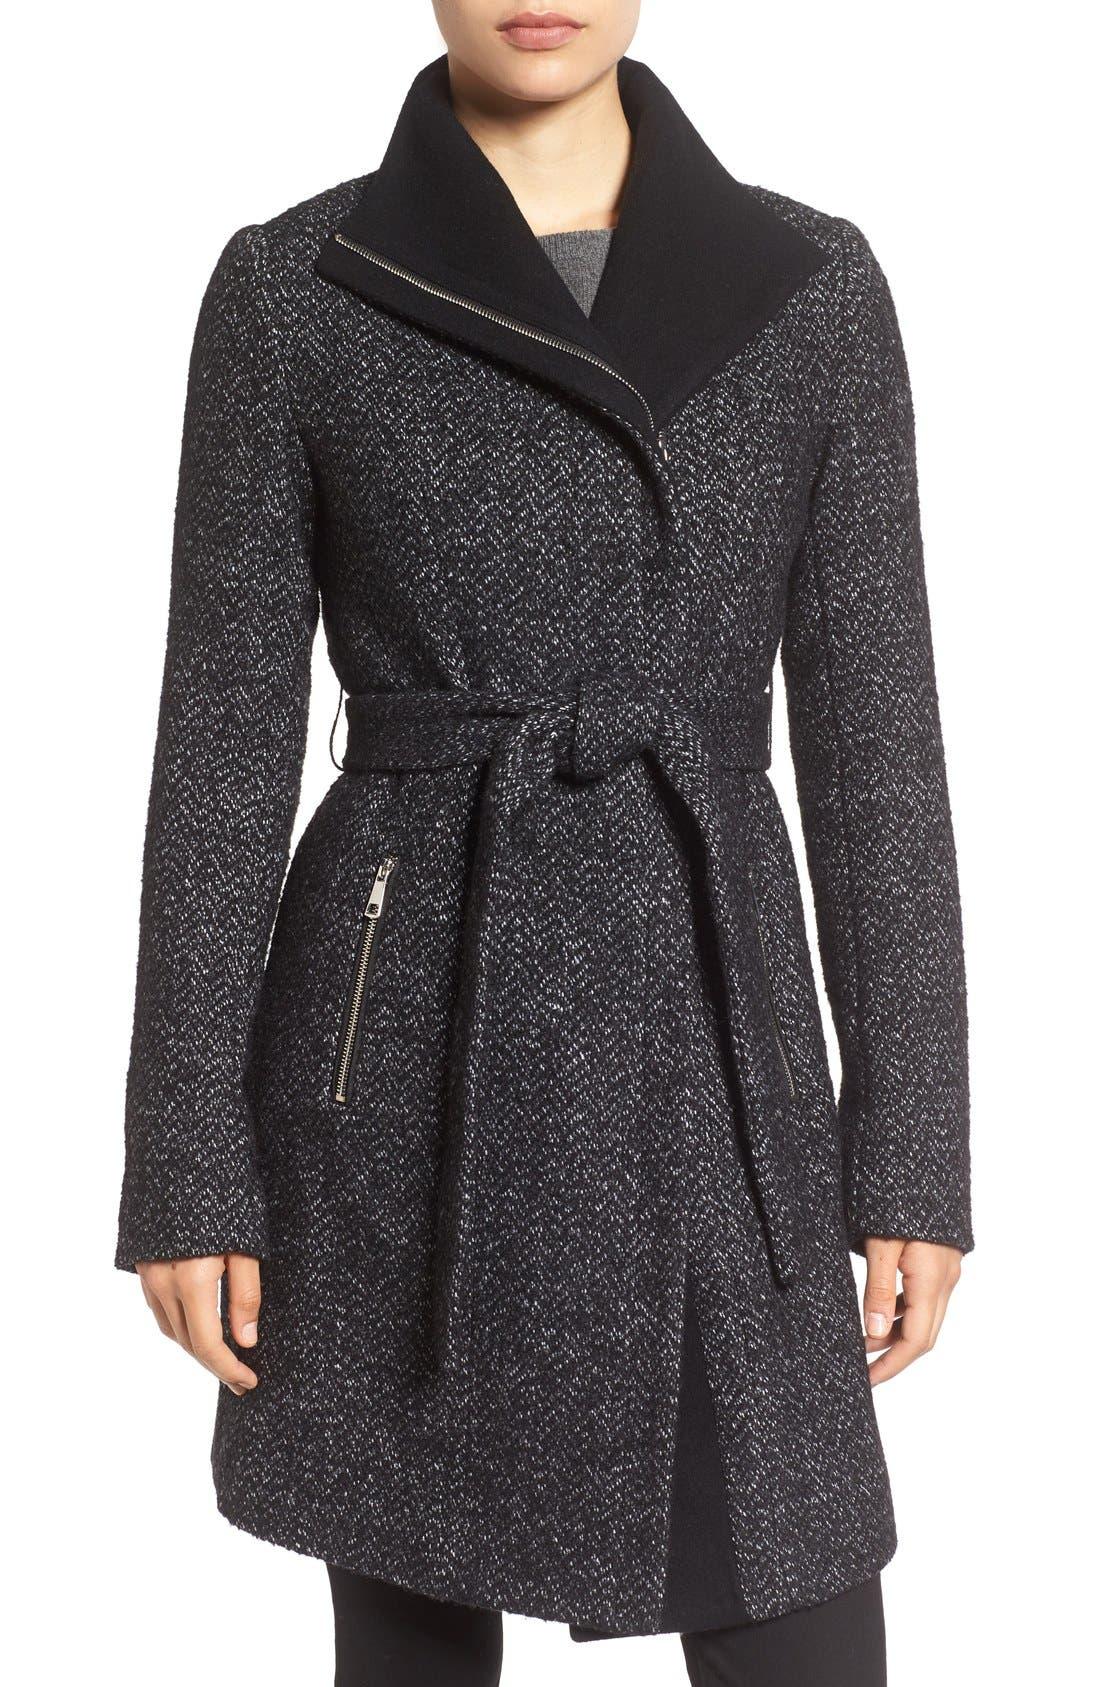 'Eva' Belted Tweed Jacket,                             Main thumbnail 1, color,                             008